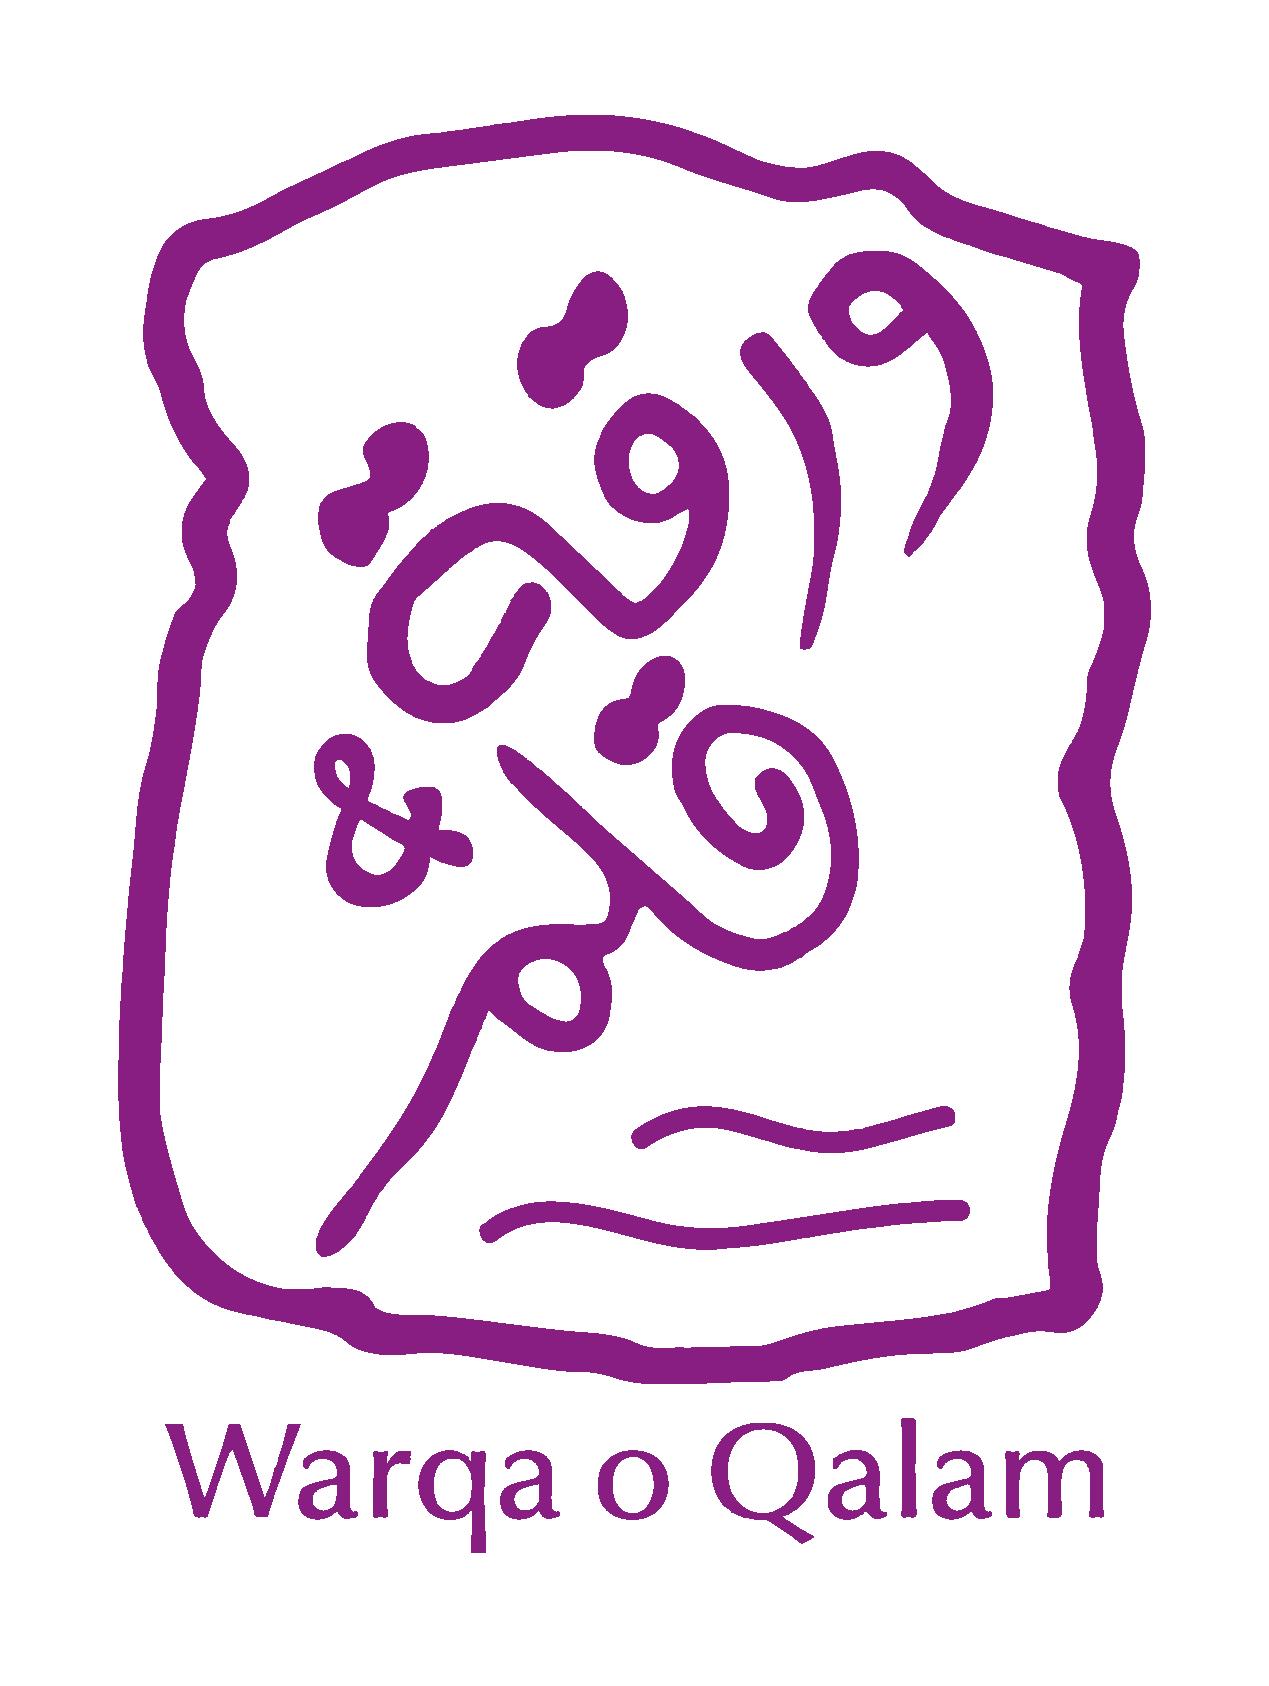 warqaoqalam | ورقة وقلم